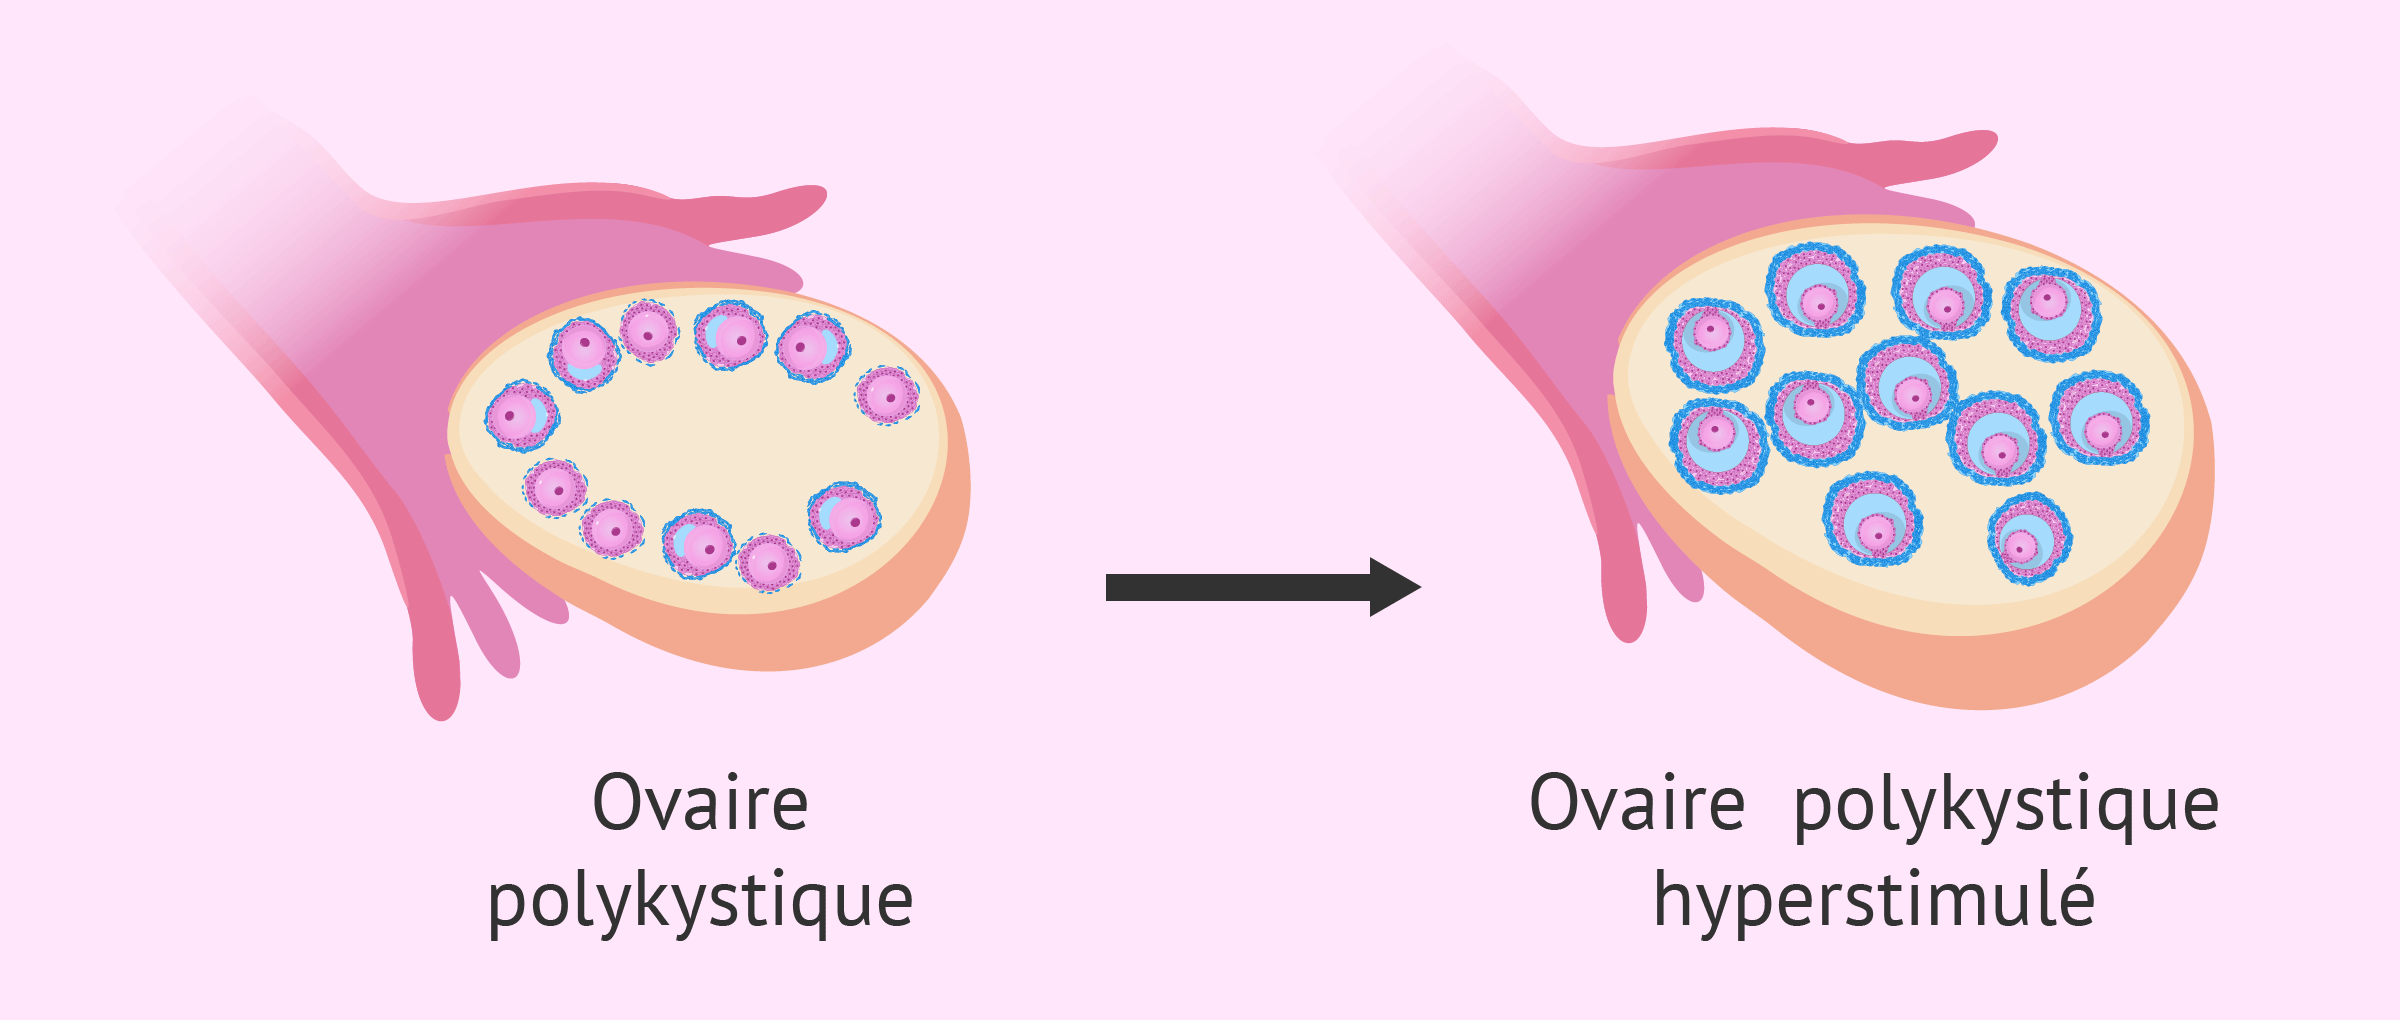 Hyperstimulation ovarienne avec un SOPK